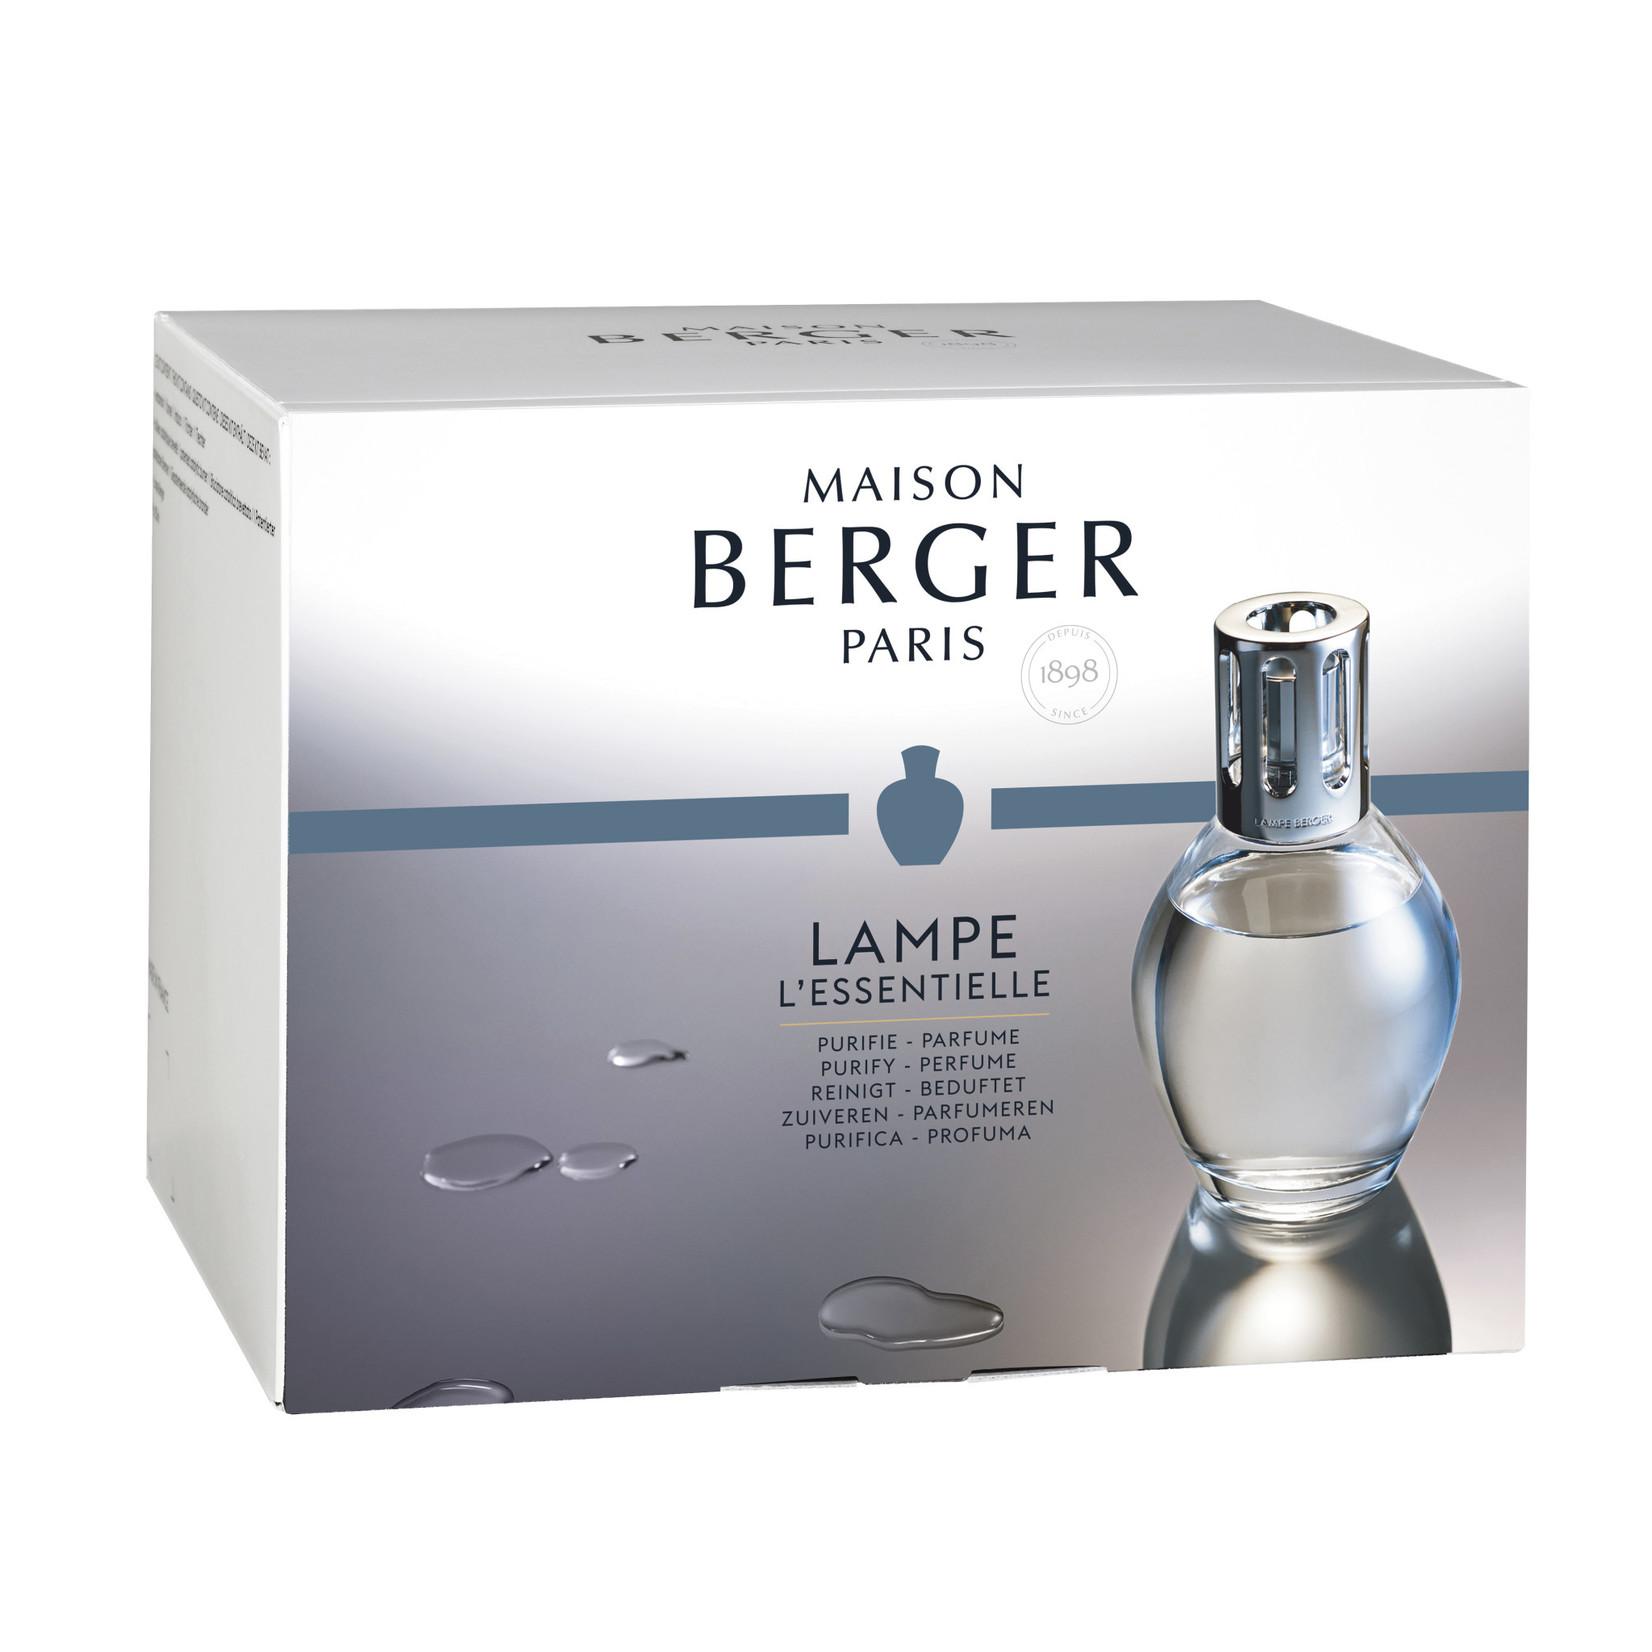 Lampe Berger Lampe Berger Huisparfum Startersset Ovale fles met 2 geur flesjes 250 ml